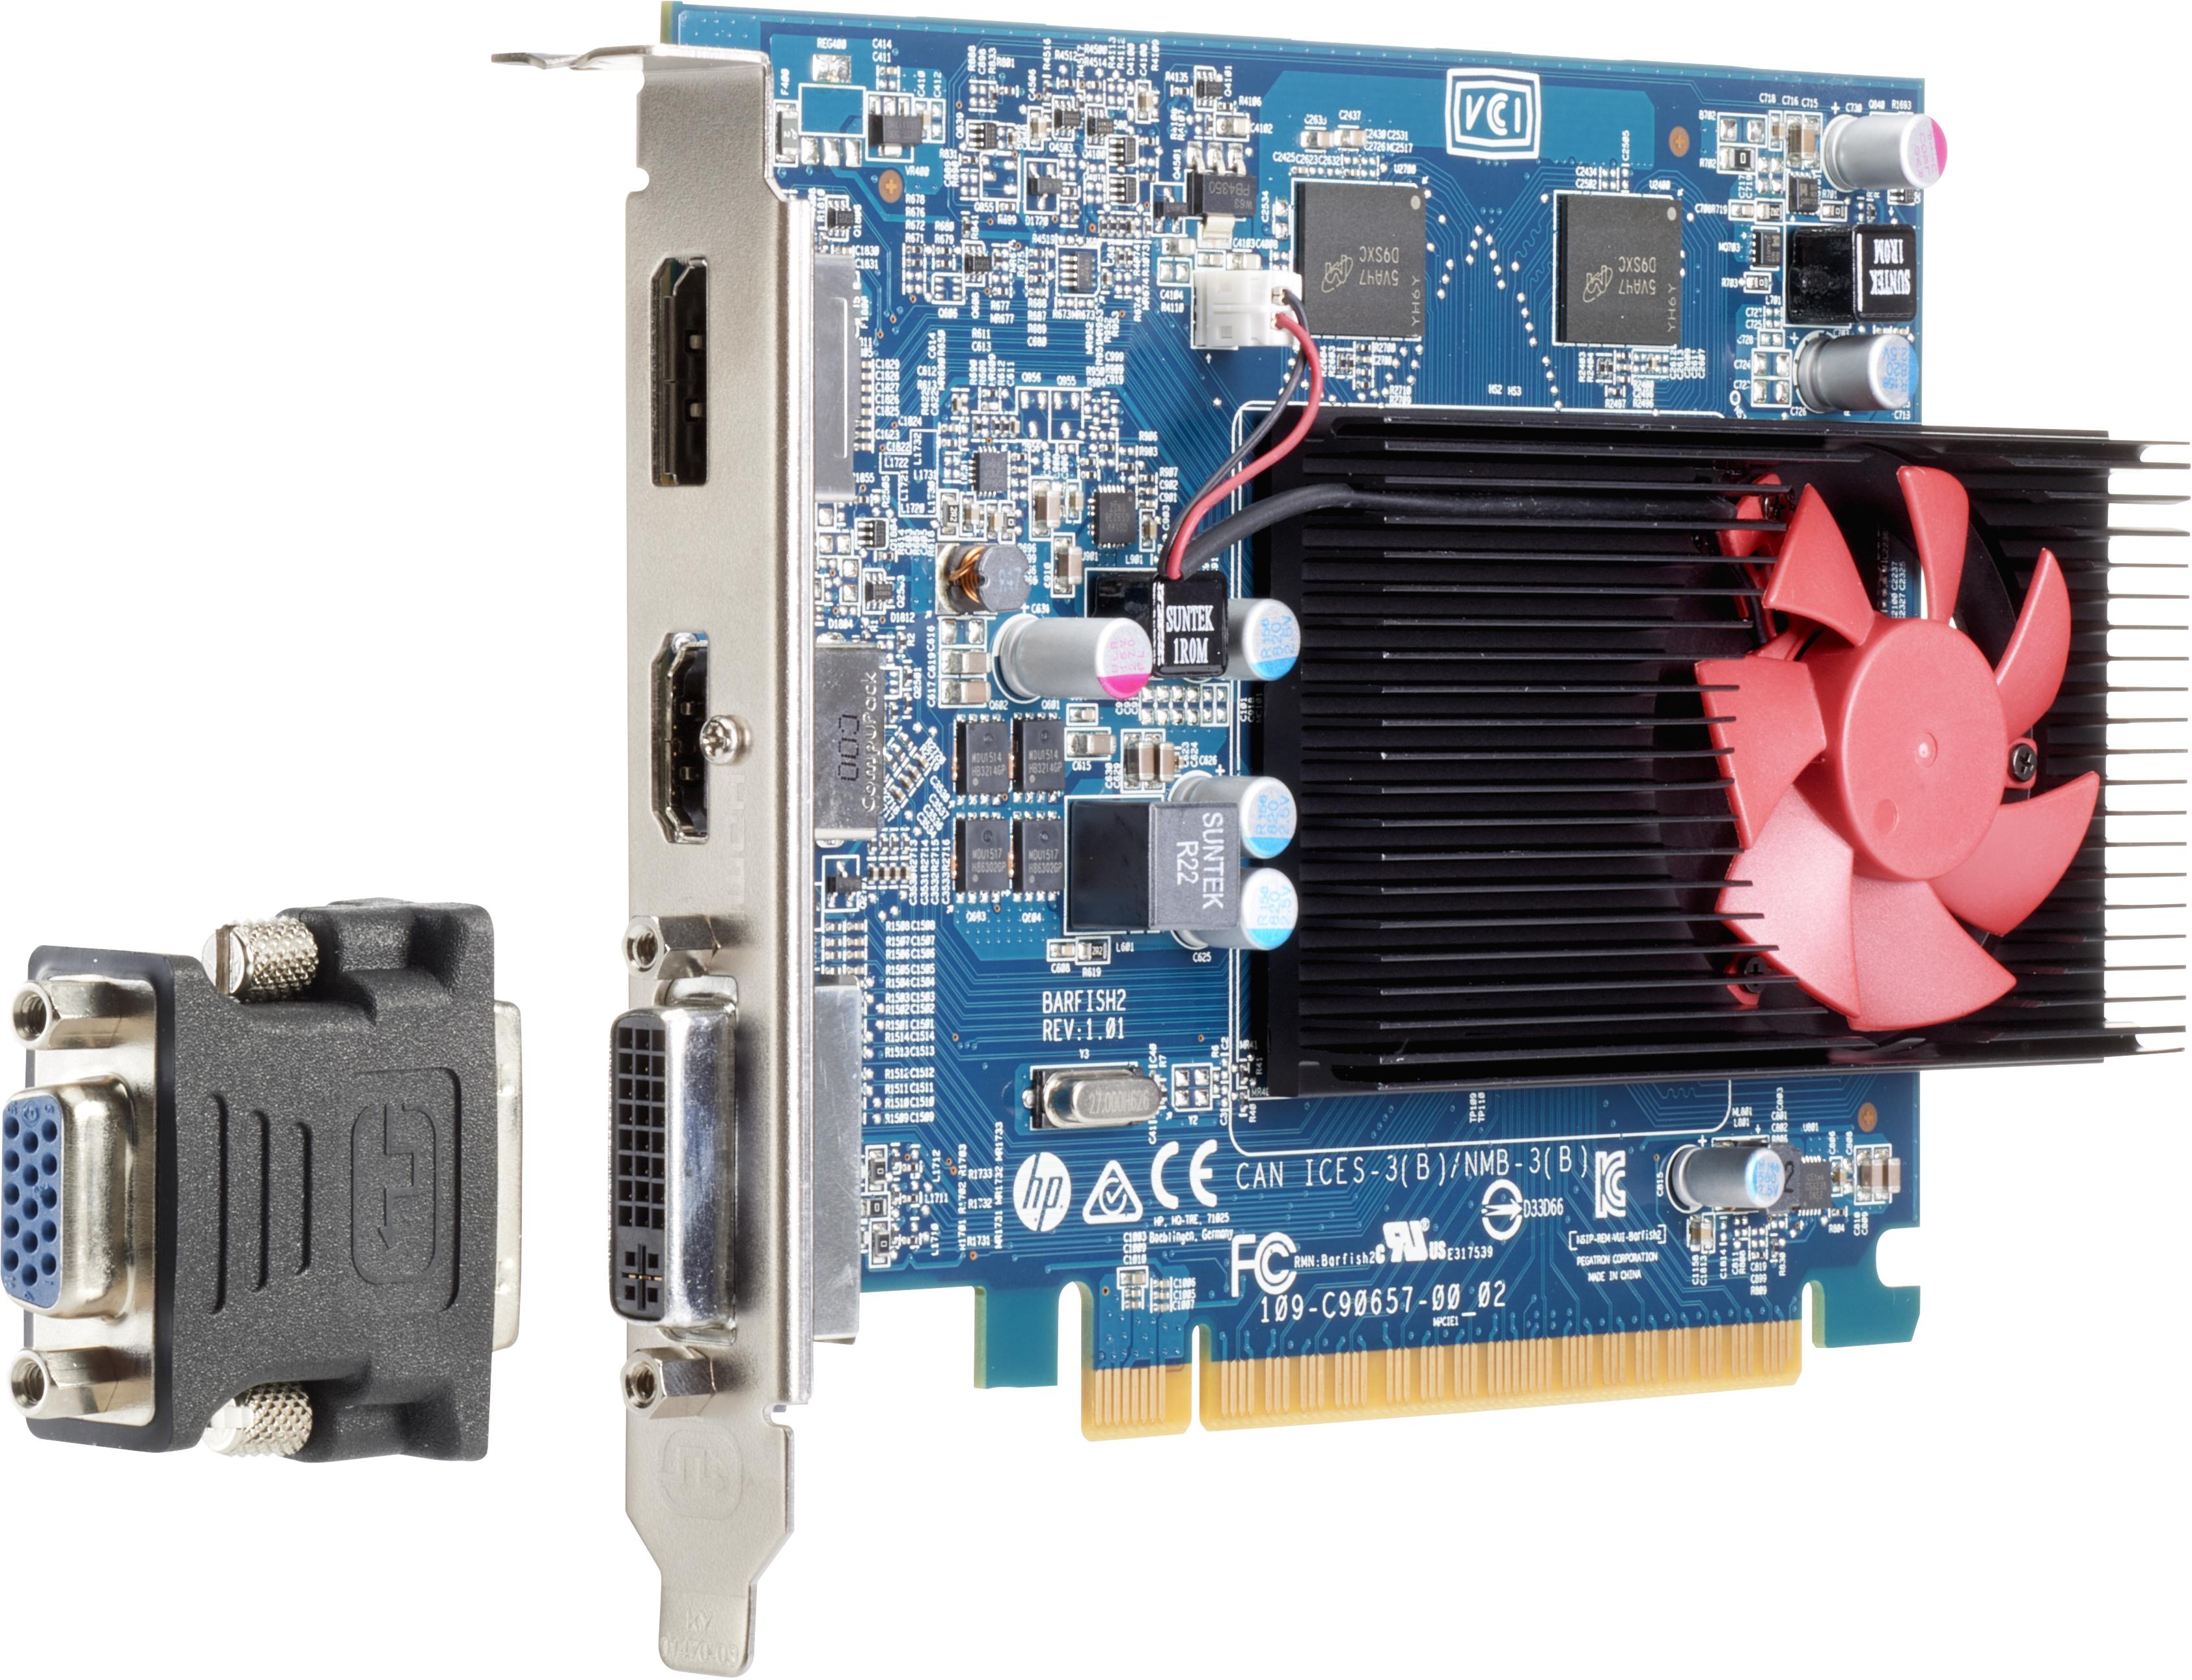 Z9h52aa Hp New Amd Radeon R7 450 Graphics Card 4 Digital Alliance Psu Gaming 500 Watt 80 Bronze Gb Ddr3